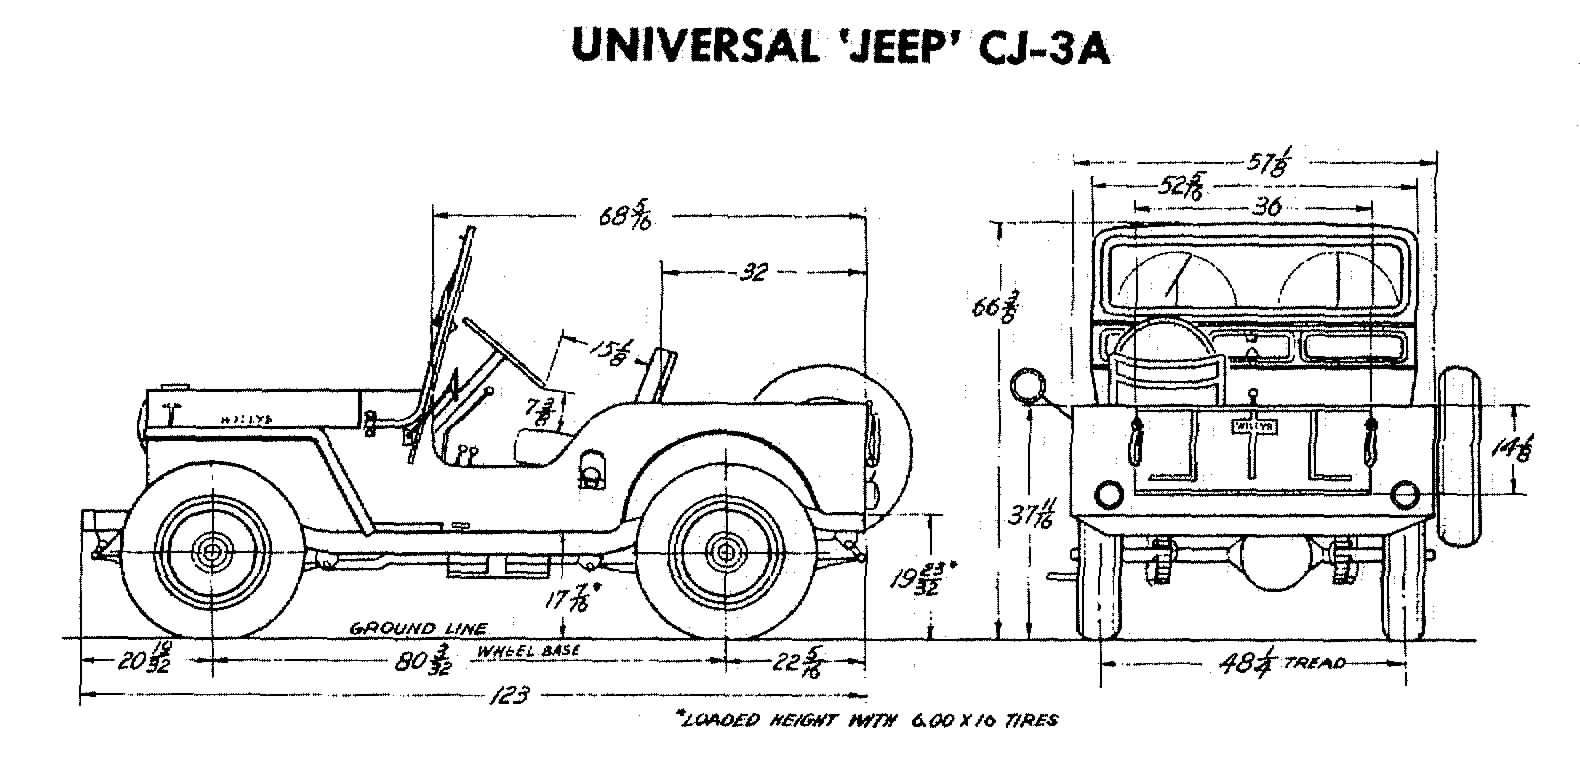 Jeep Cj 3a Size Specs